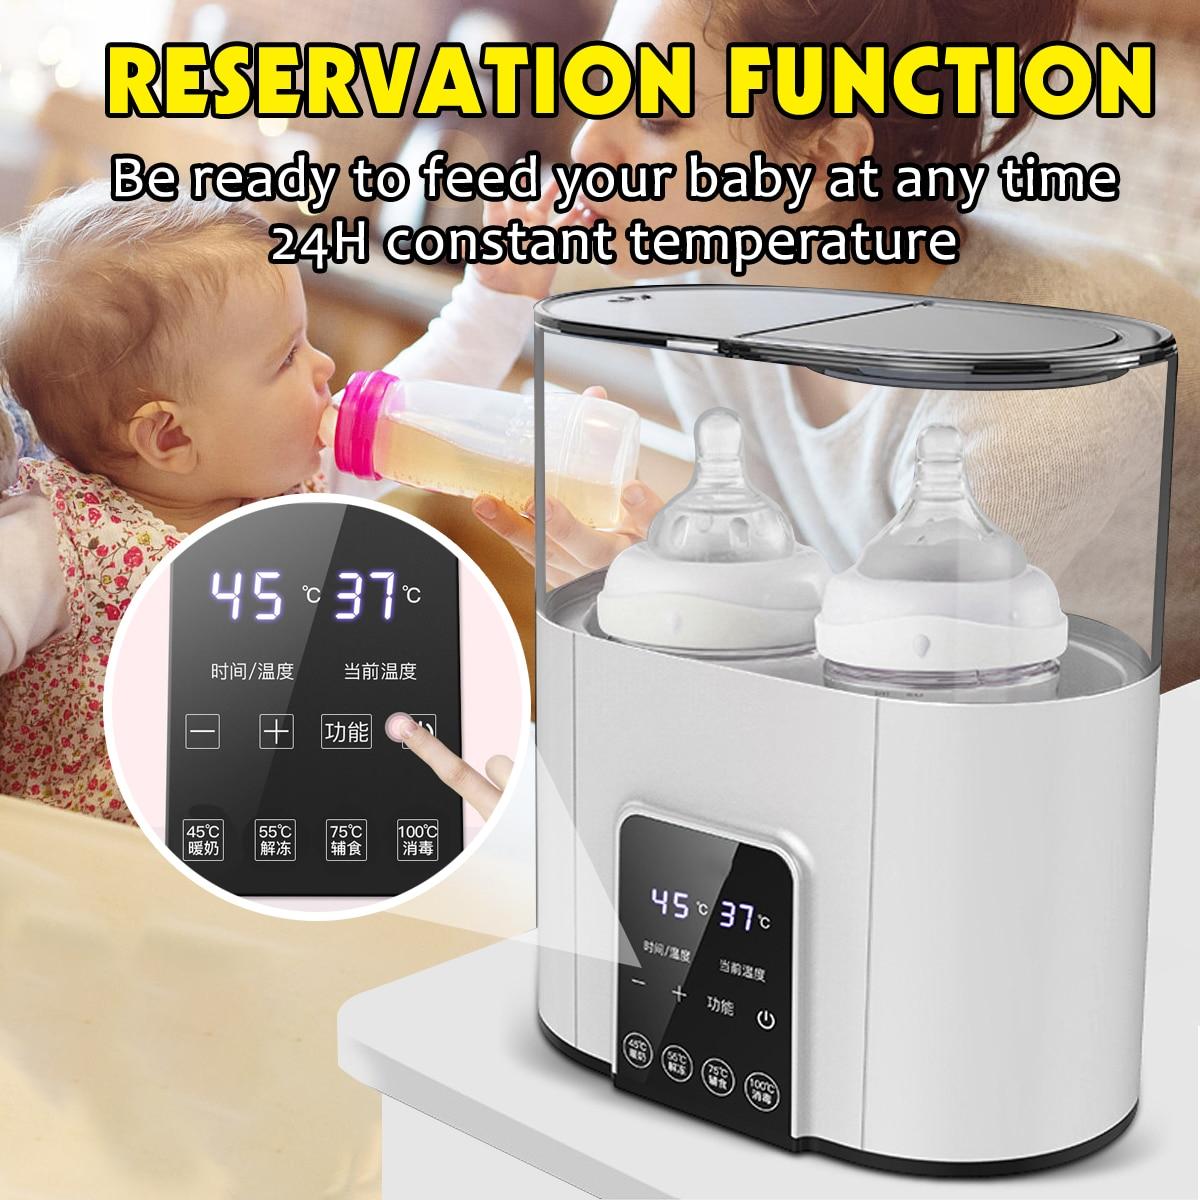 6 In 1 Smart Universal BabyFood Warm Baby Feeding Bottle Warmer Heater Sterilizer 220V Electric Milk Food Warmers With Timer